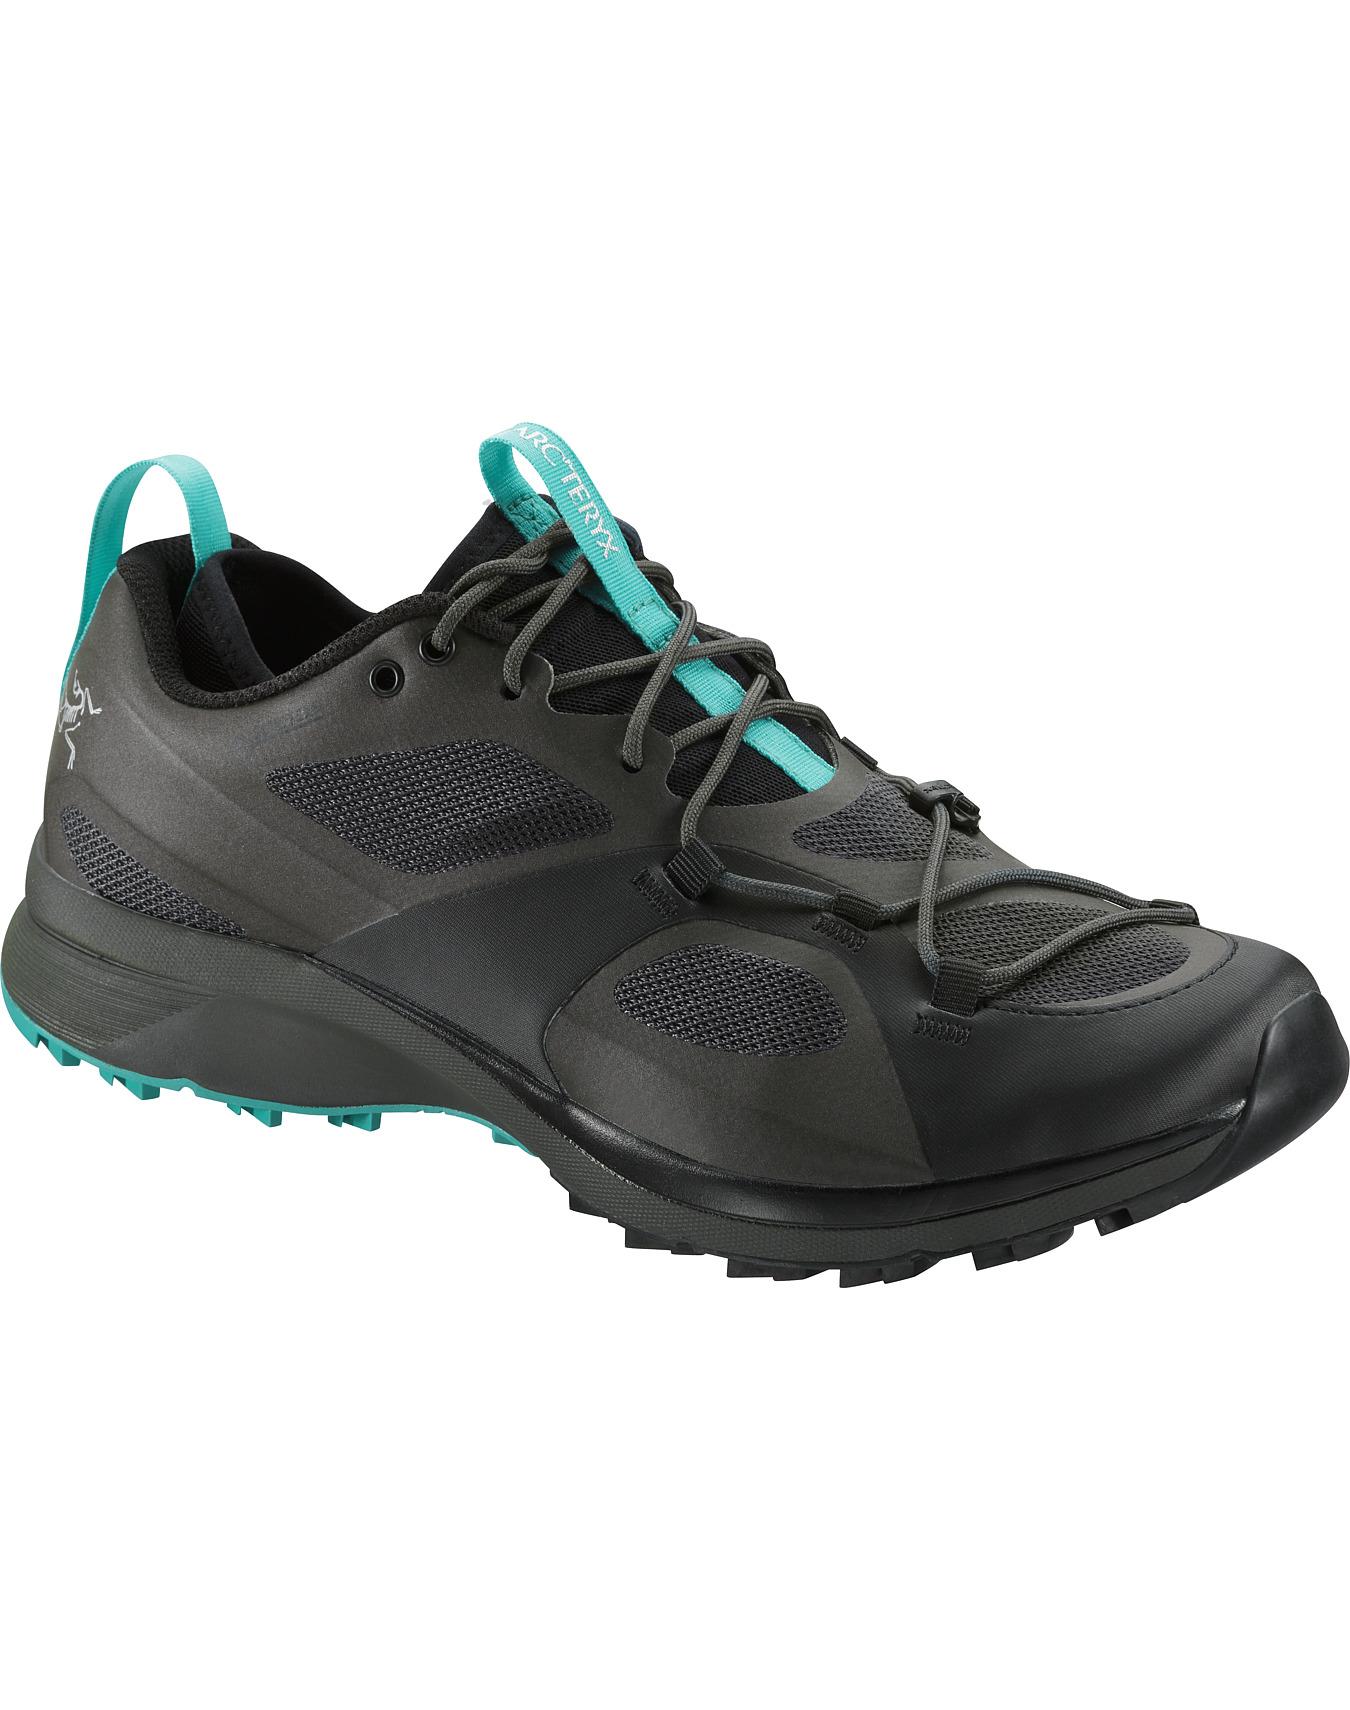 e91b28176a71b5 Norvan VT GTX Shoe   Damen   Arc teryx